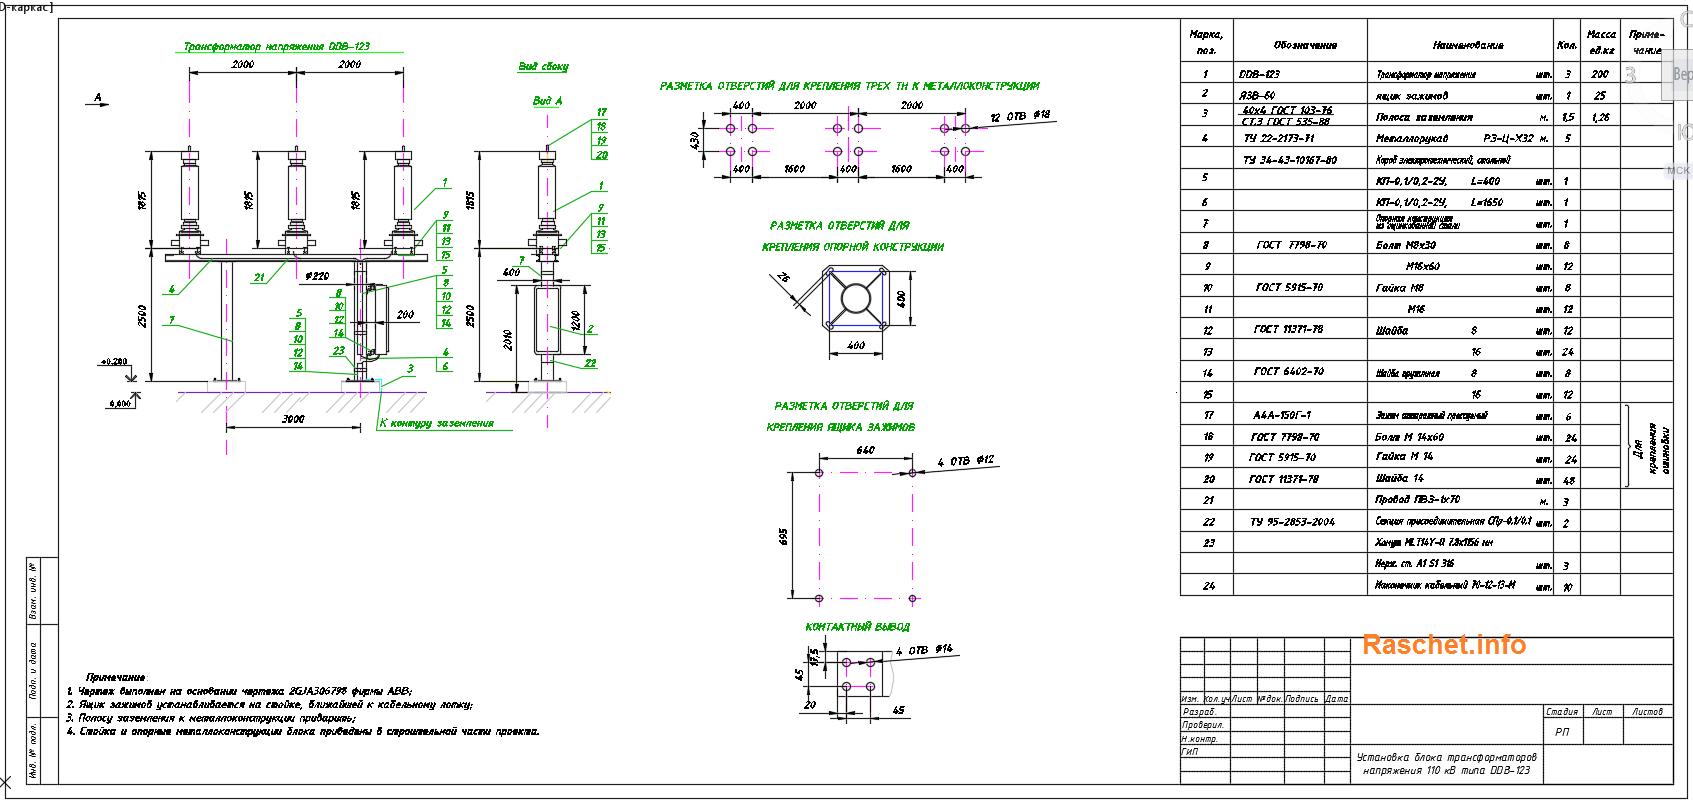 Чертеж установки трансформаторов напряжения типа DDB-123 в формате dwg